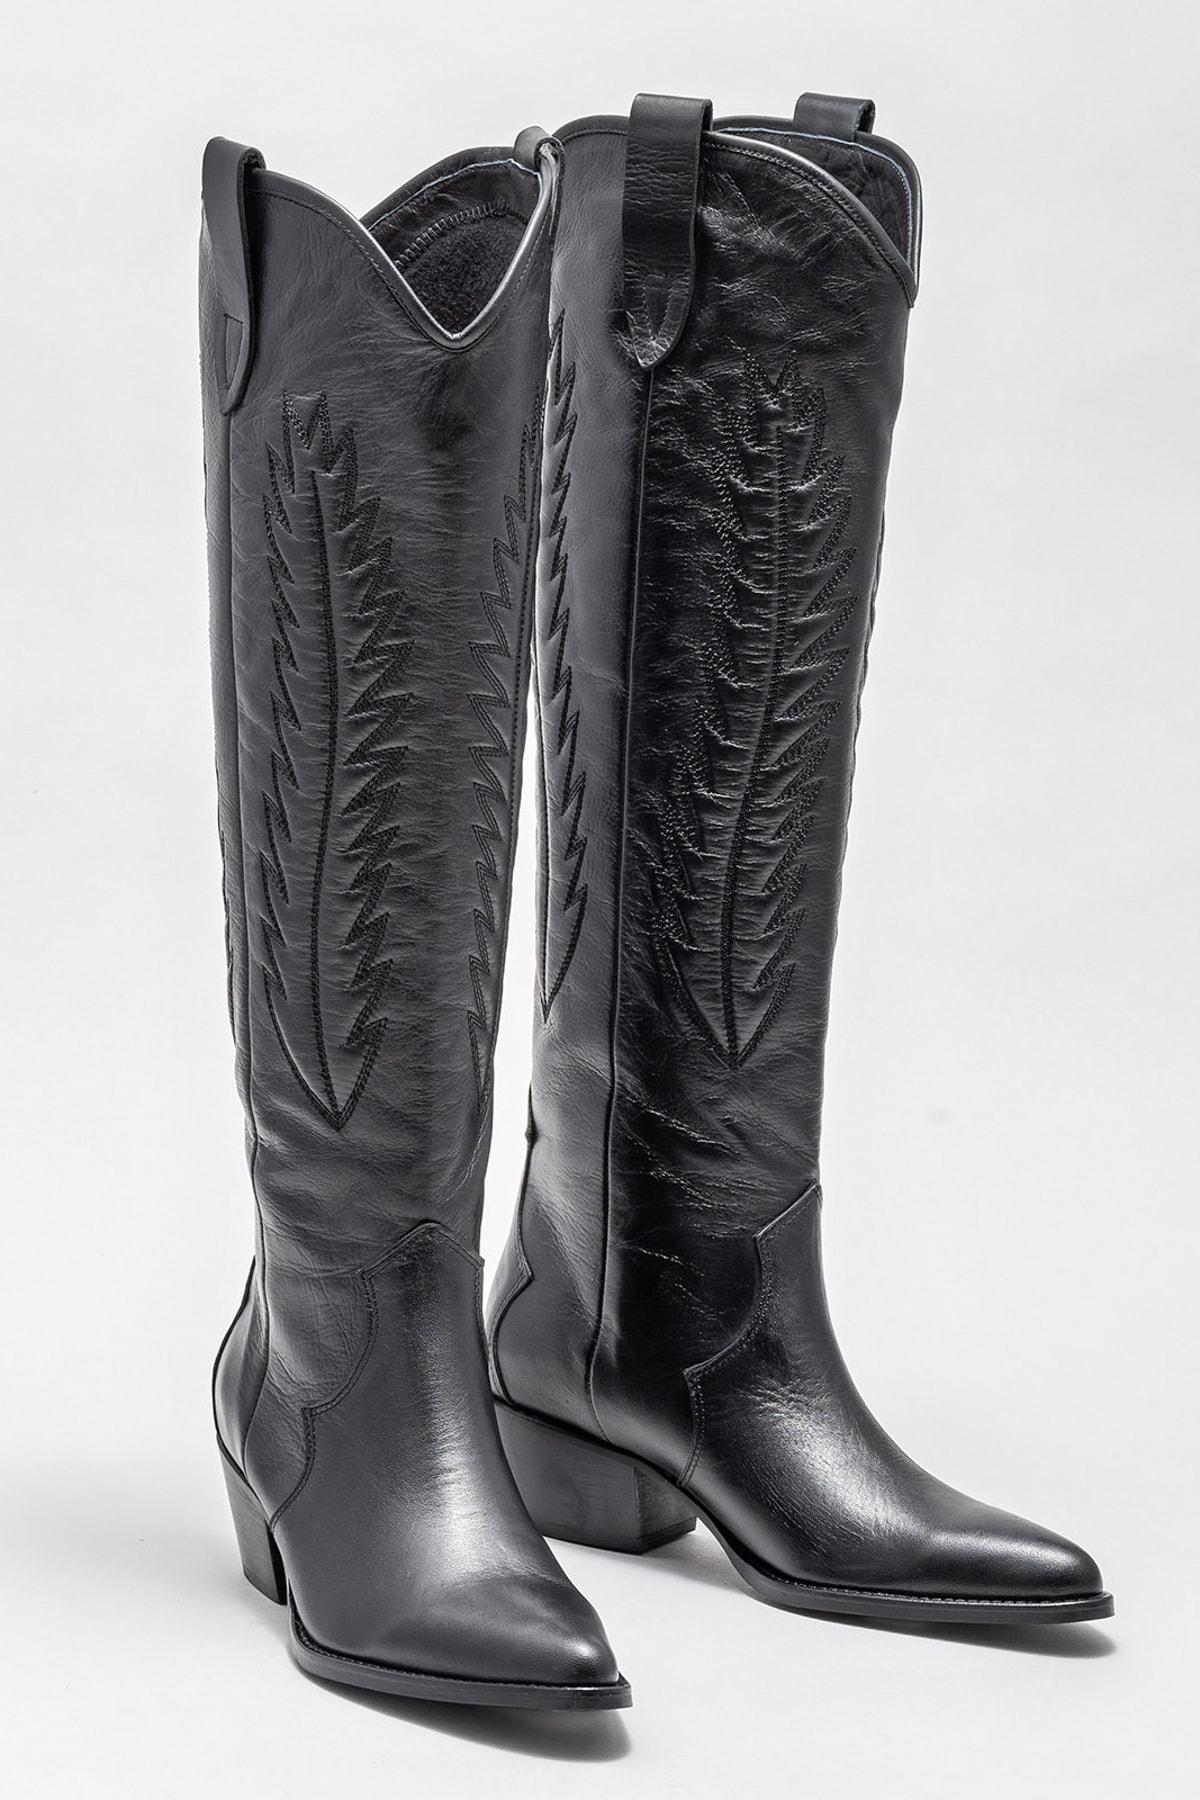 Elle Shoes Kadın COHAN-1 Çizme 20K045 2